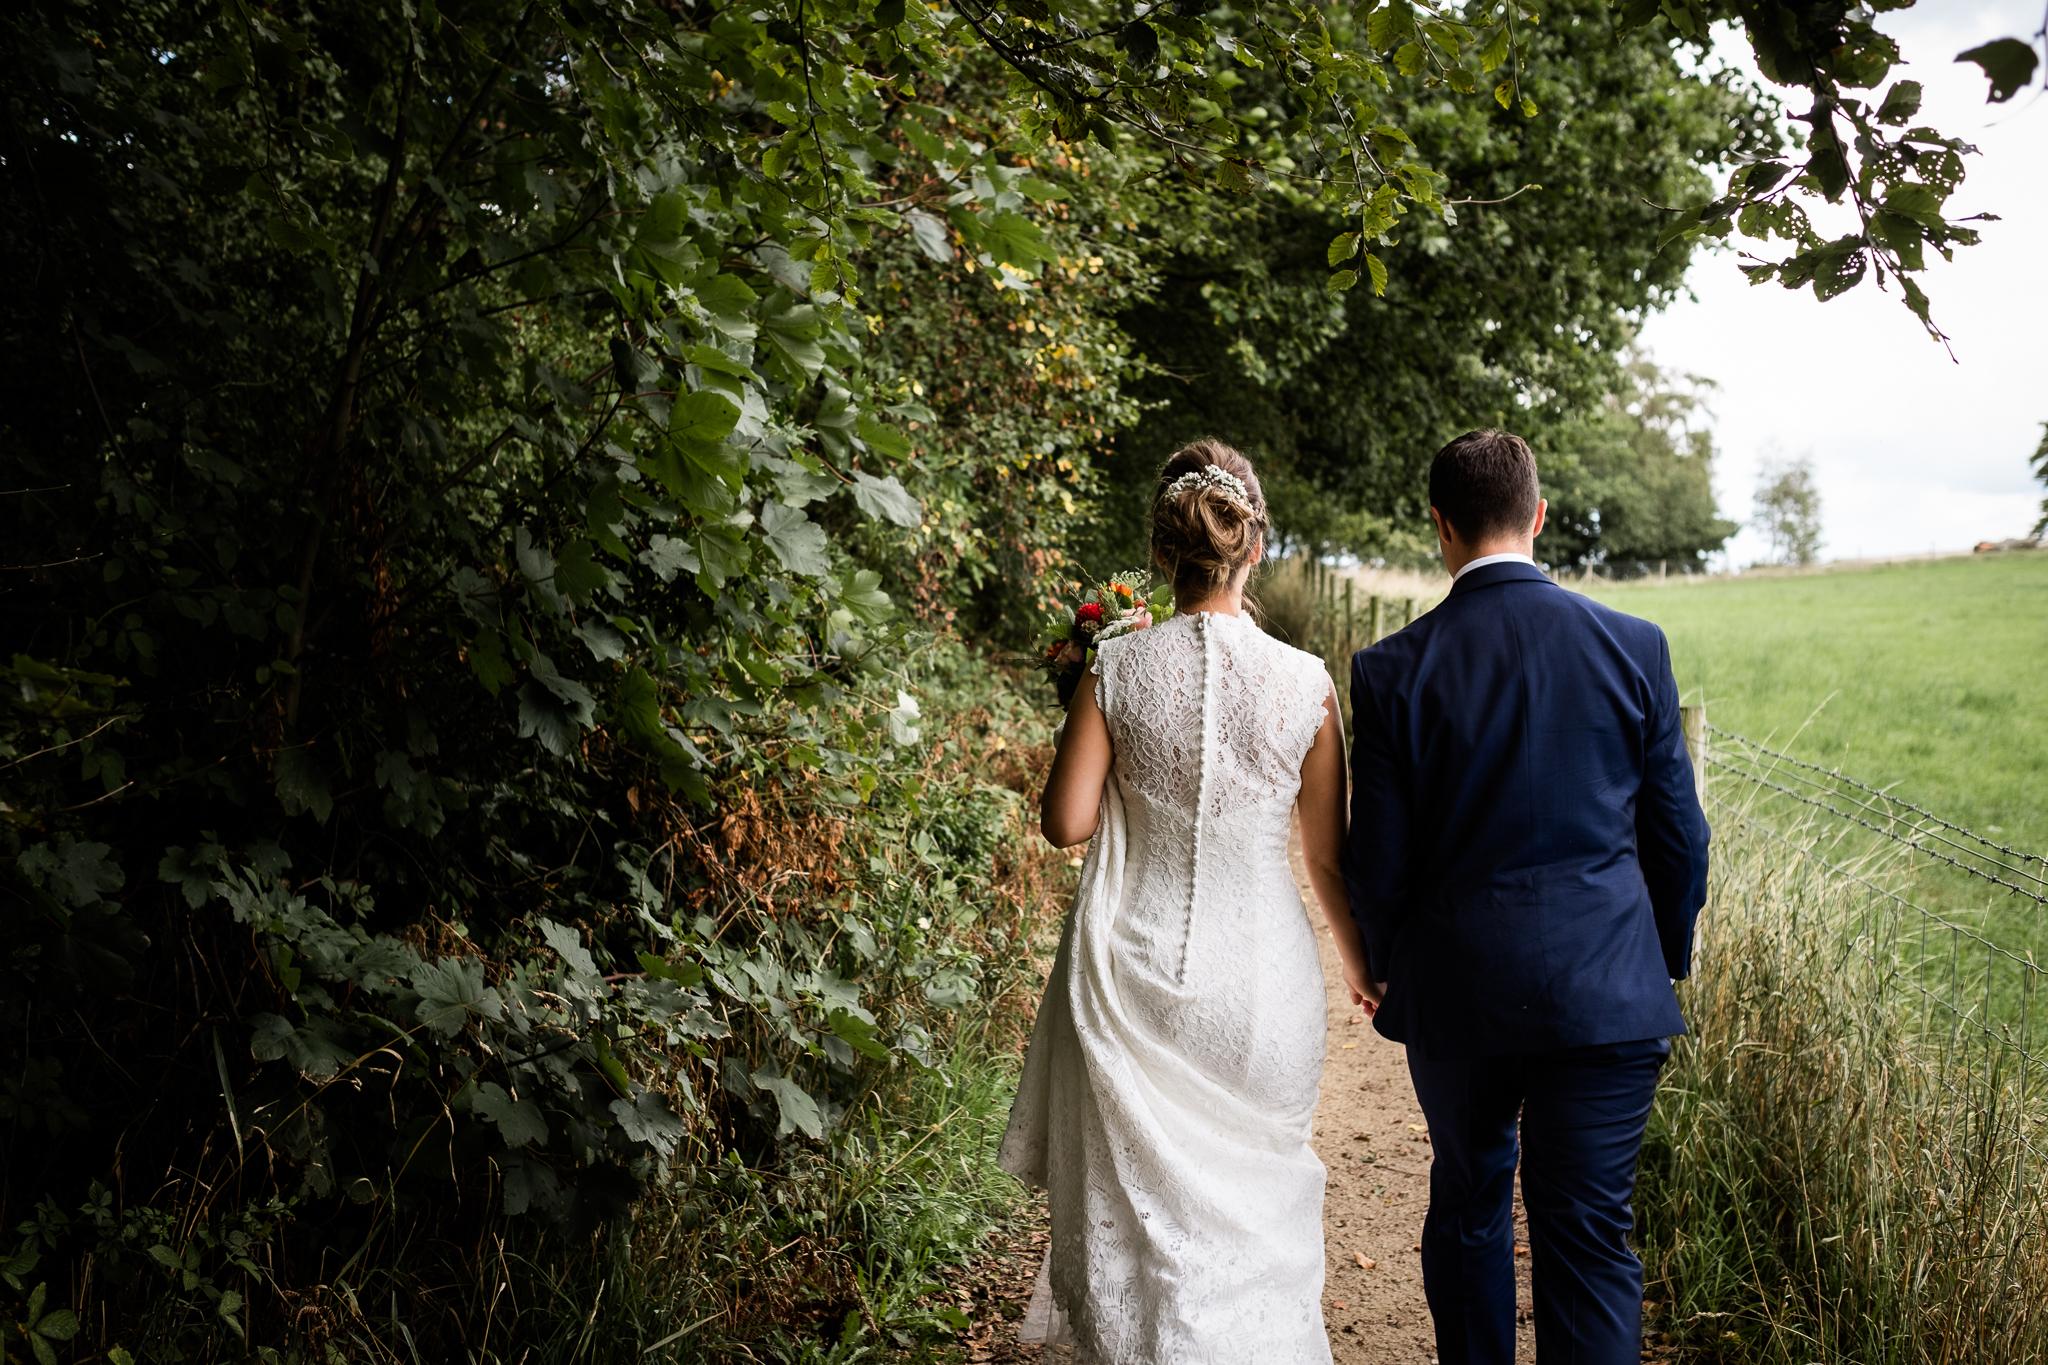 Relaxed Documentary Wedding Photography at The Wizard Inn, Alderley Edge Cheshire - Jenny Harper-43.jpg